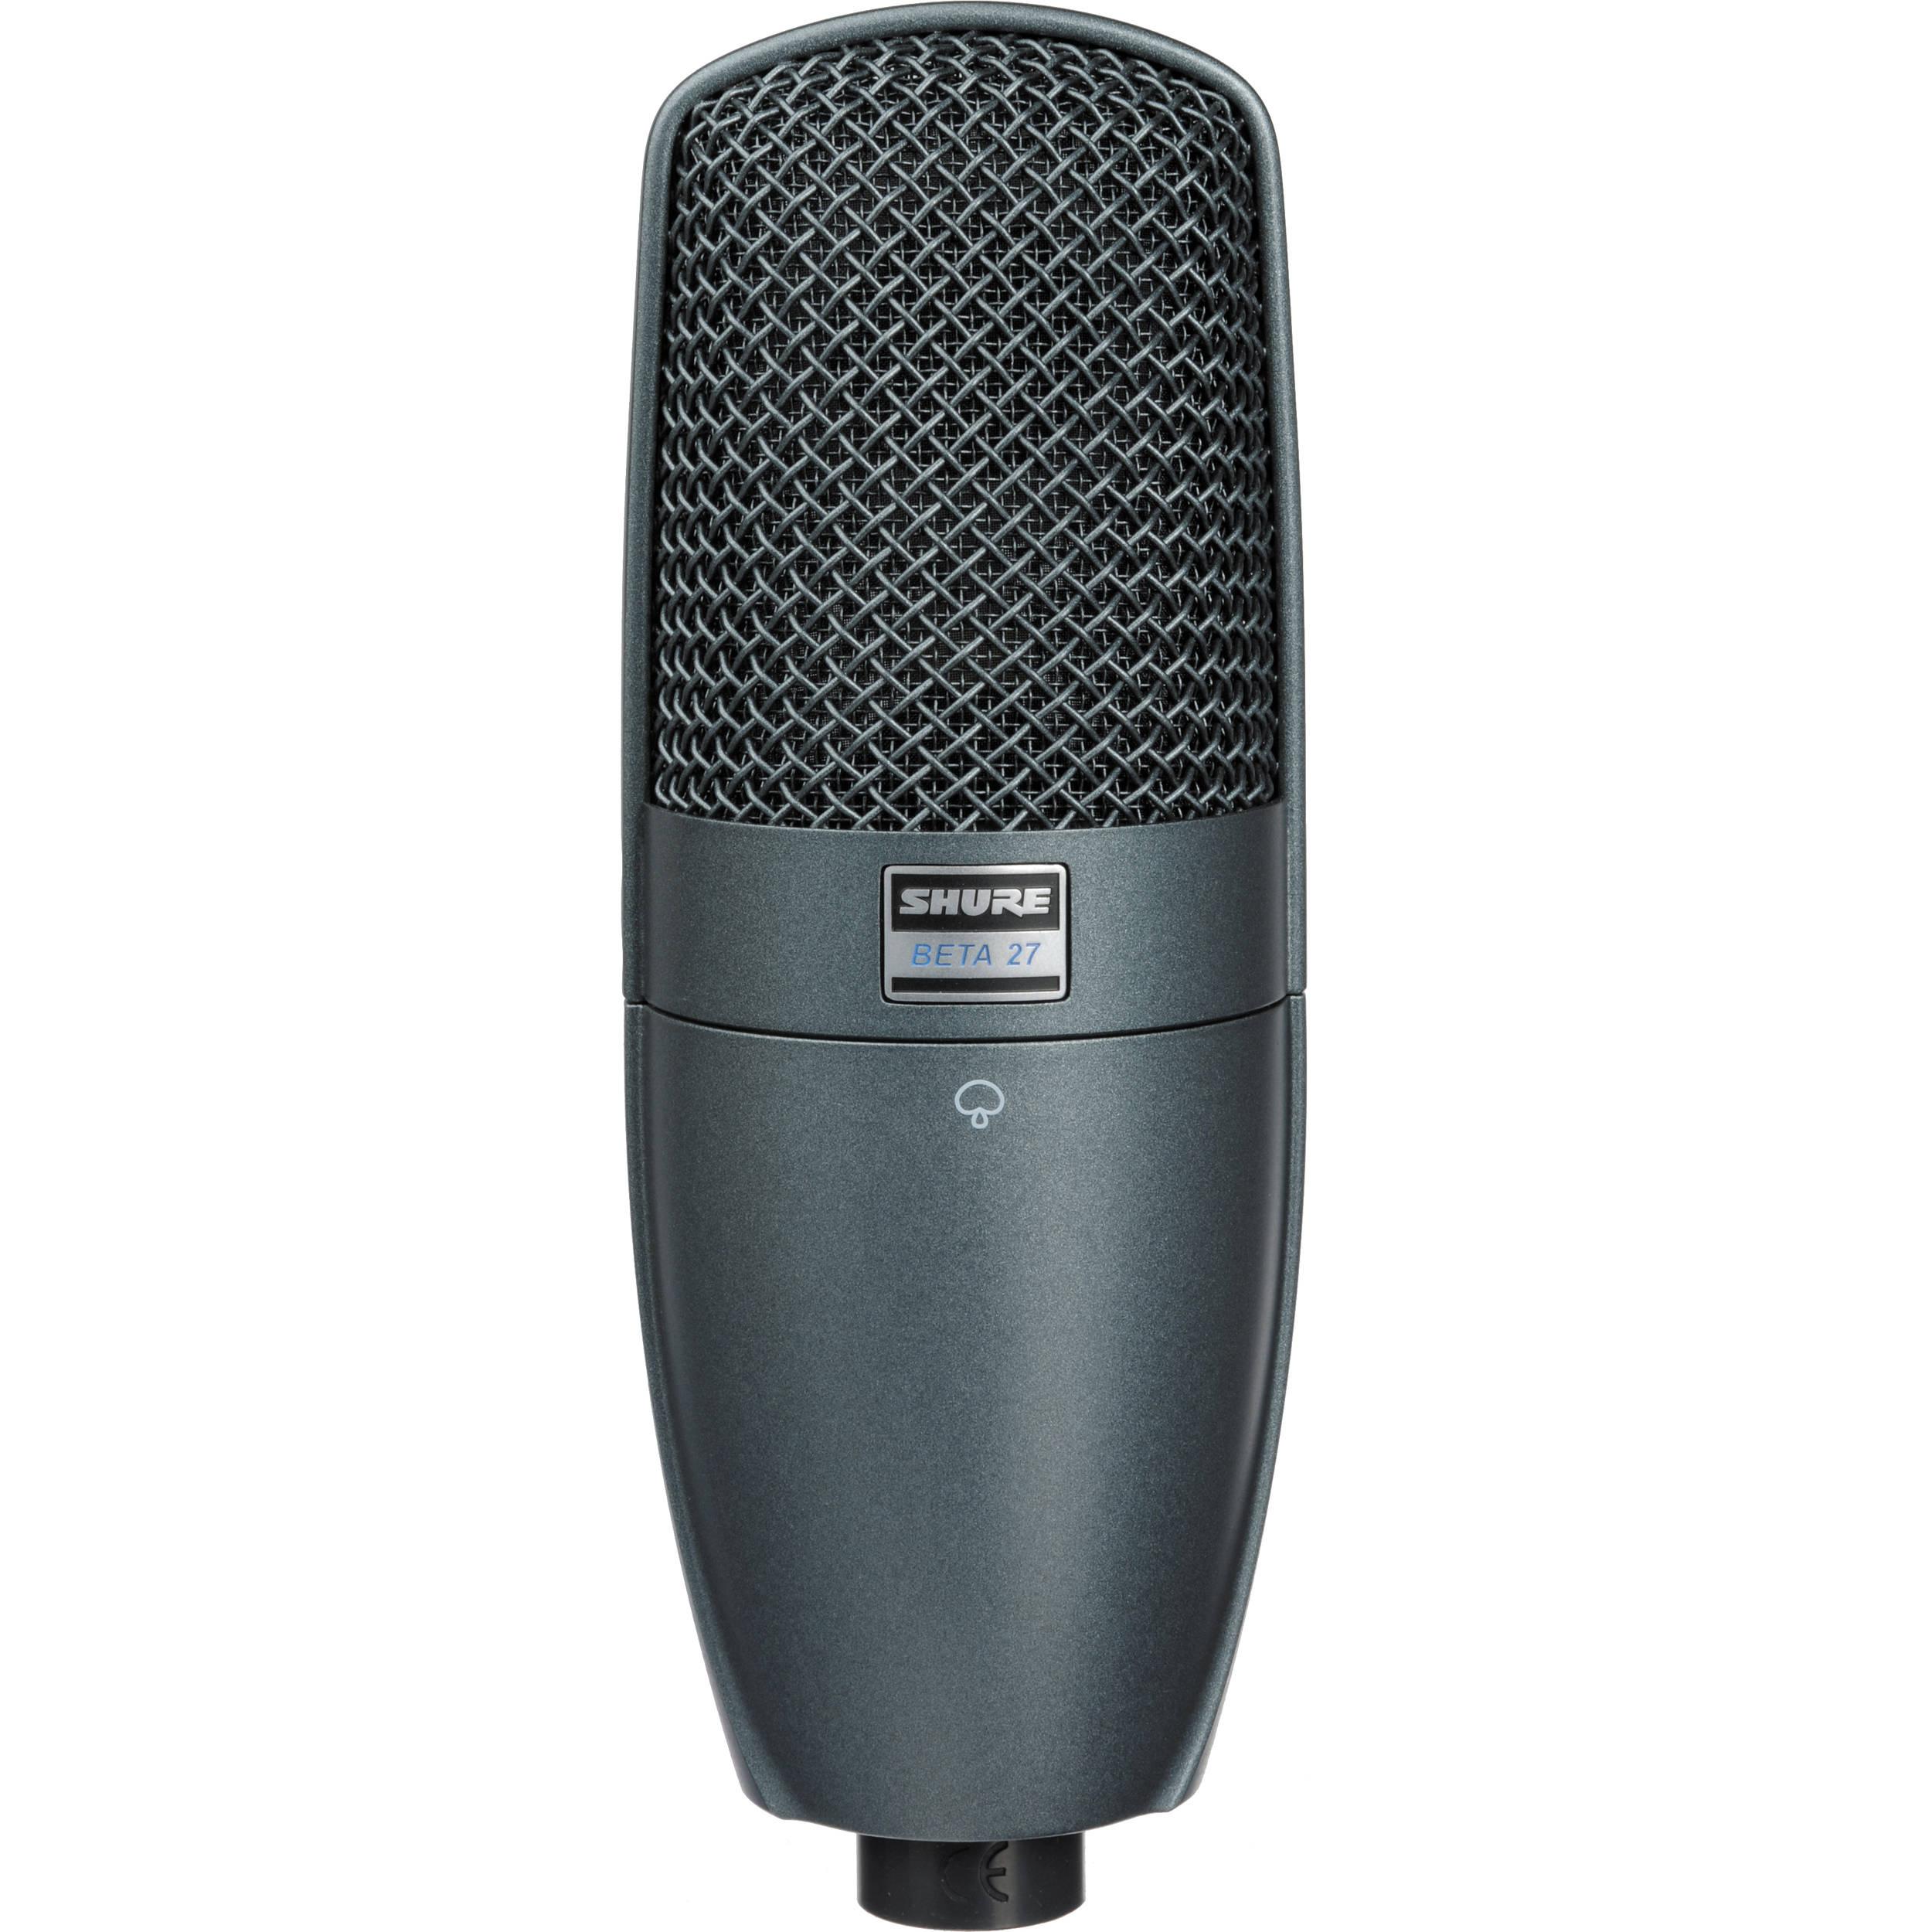 Shure BETA27 Condenser Microphone